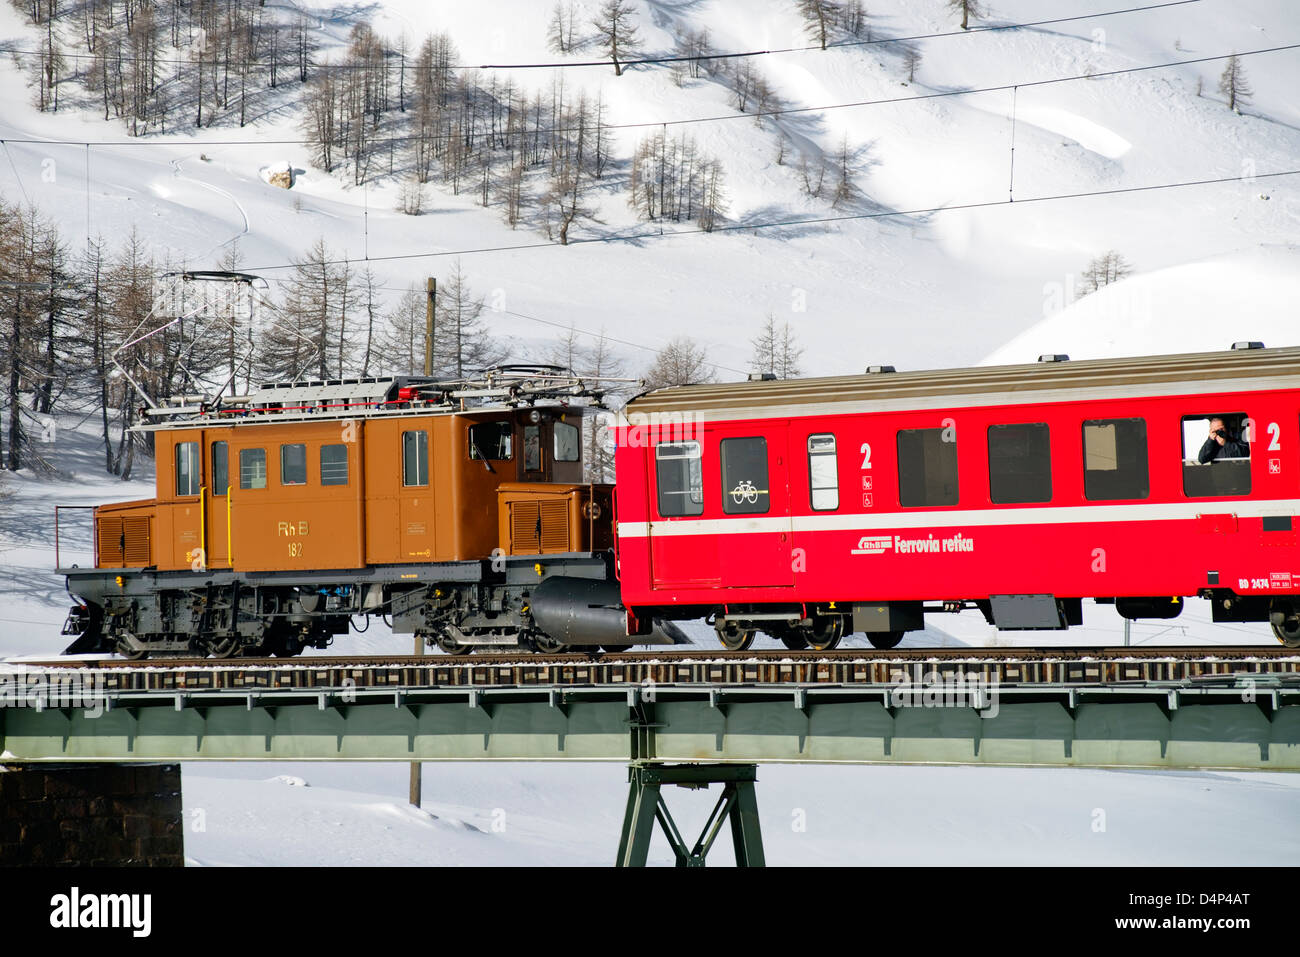 Krokodil Lokomotive der Rhaetischen Bahn am Bernina Pass, Schweiz | Crocodile locomotive, Bernina Pass, Switzerland Stock Photo